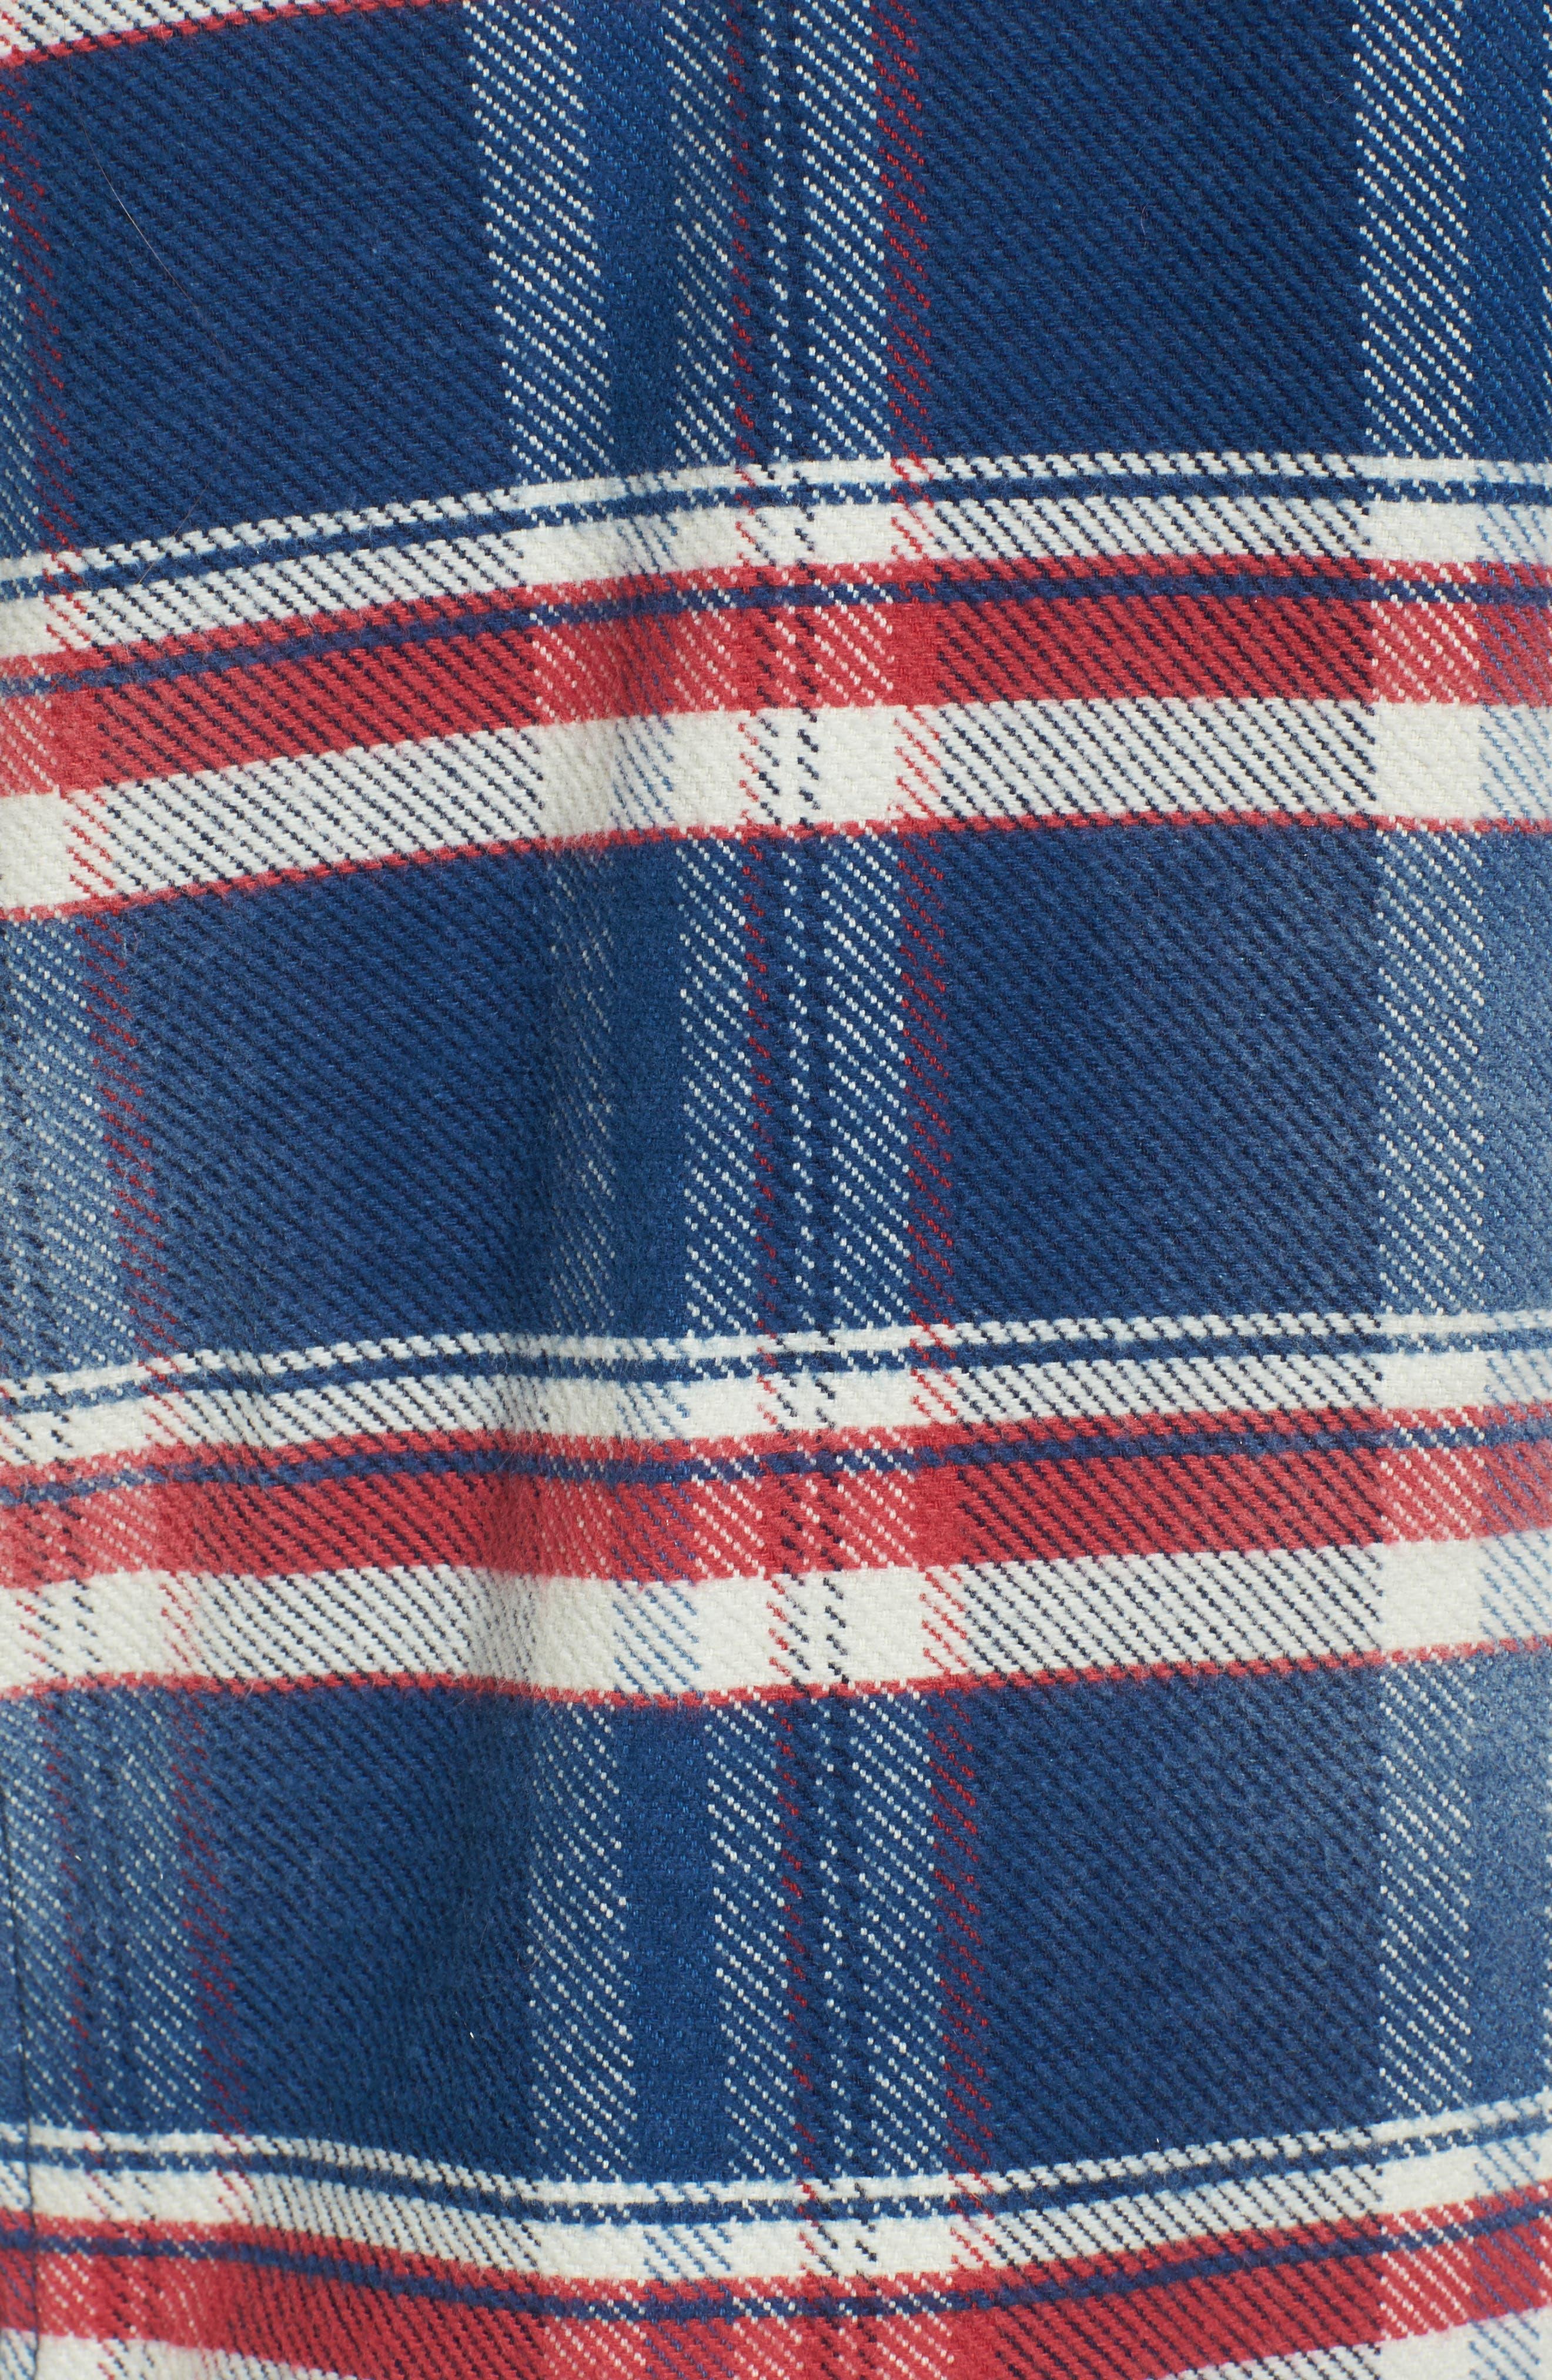 Ella Plaid Denim Jacket with Faux Shearling Collar,                             Alternate thumbnail 6, color,                             479